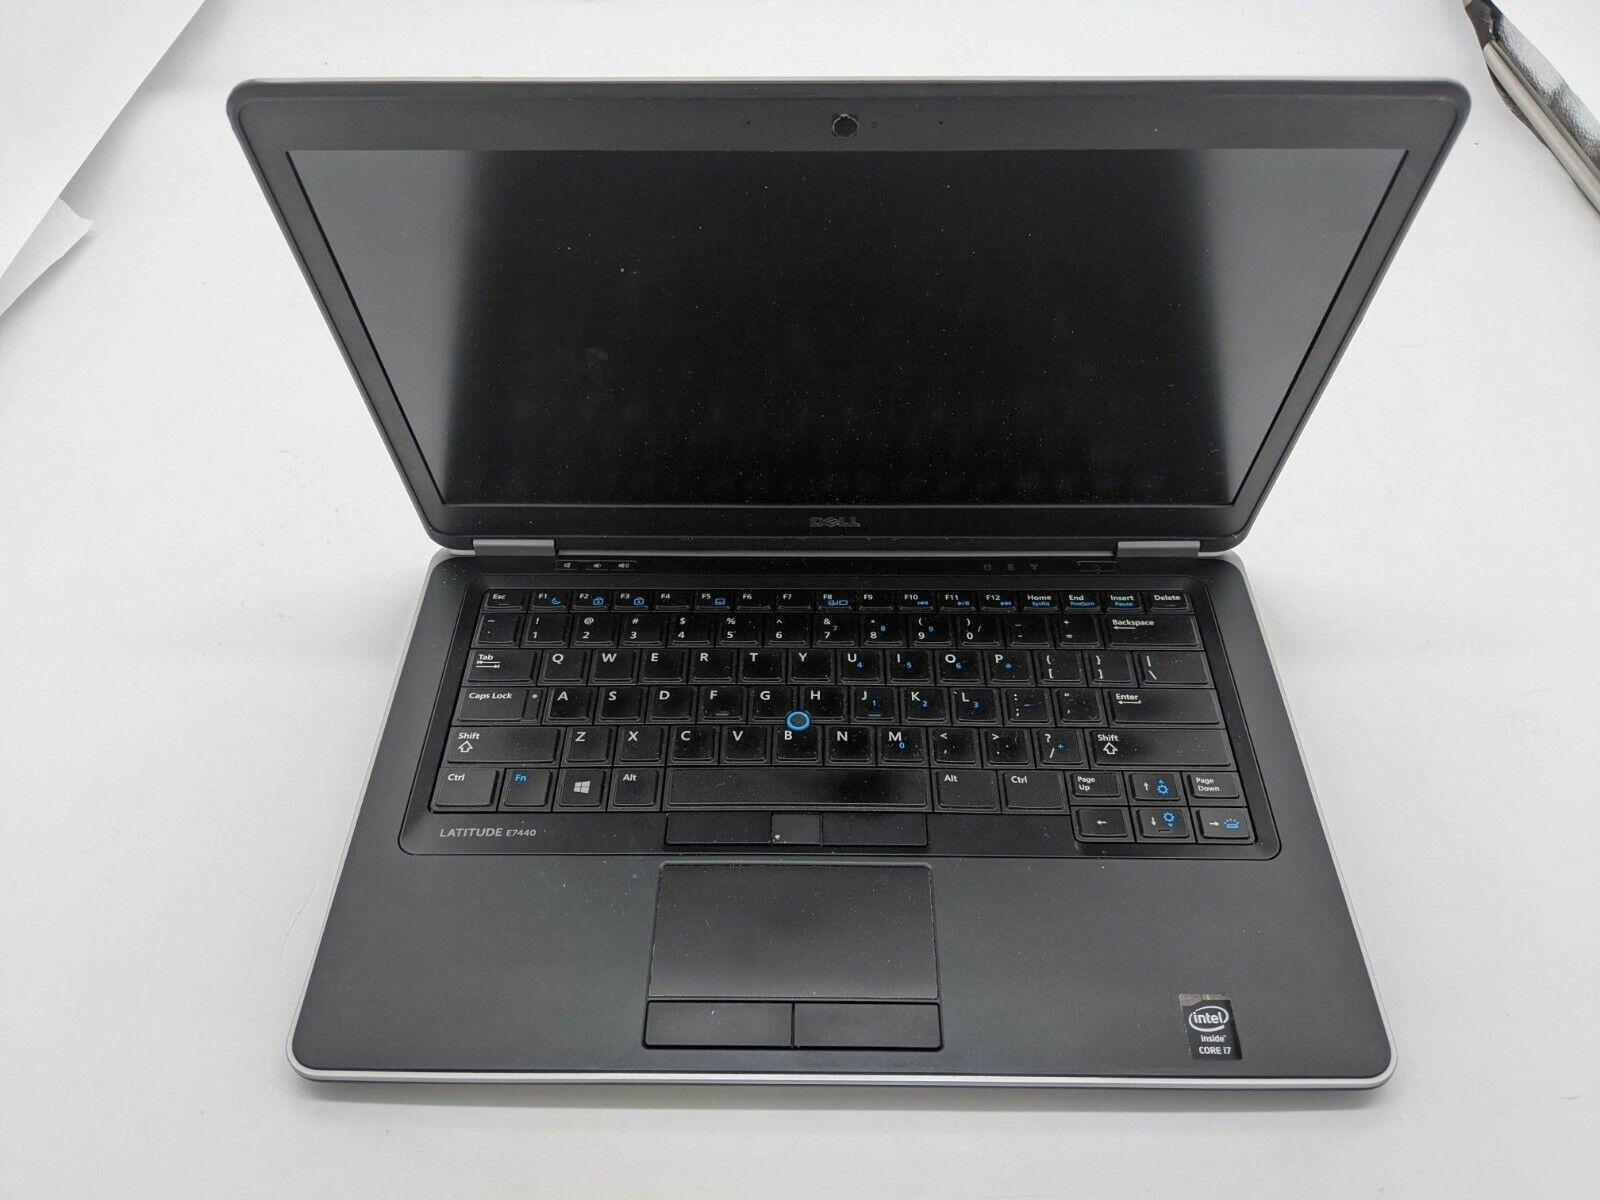 Laptop Windows - Good Dell Latitude E7440 Intel i7 16GB DDR3 Windows 10 250GB SSD - CL3360